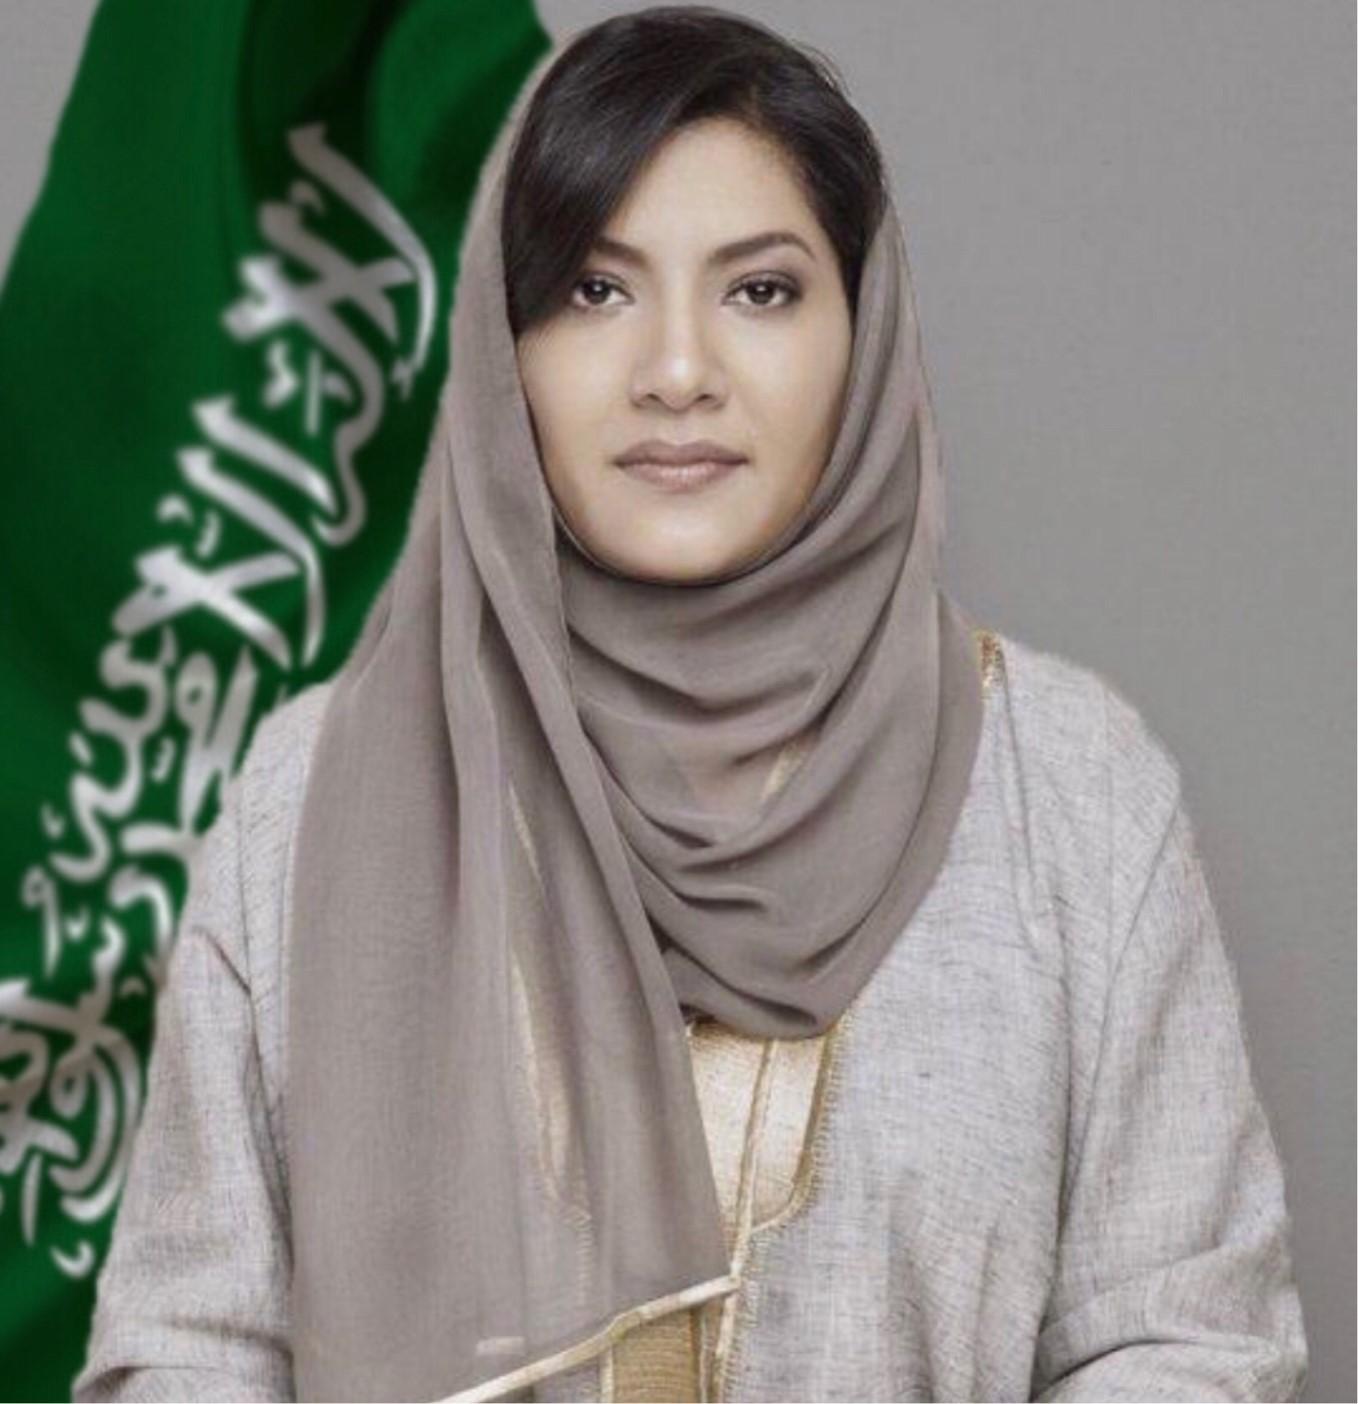 The Ambassador The Embassy Of The Kingdom Of Saudi Arabia